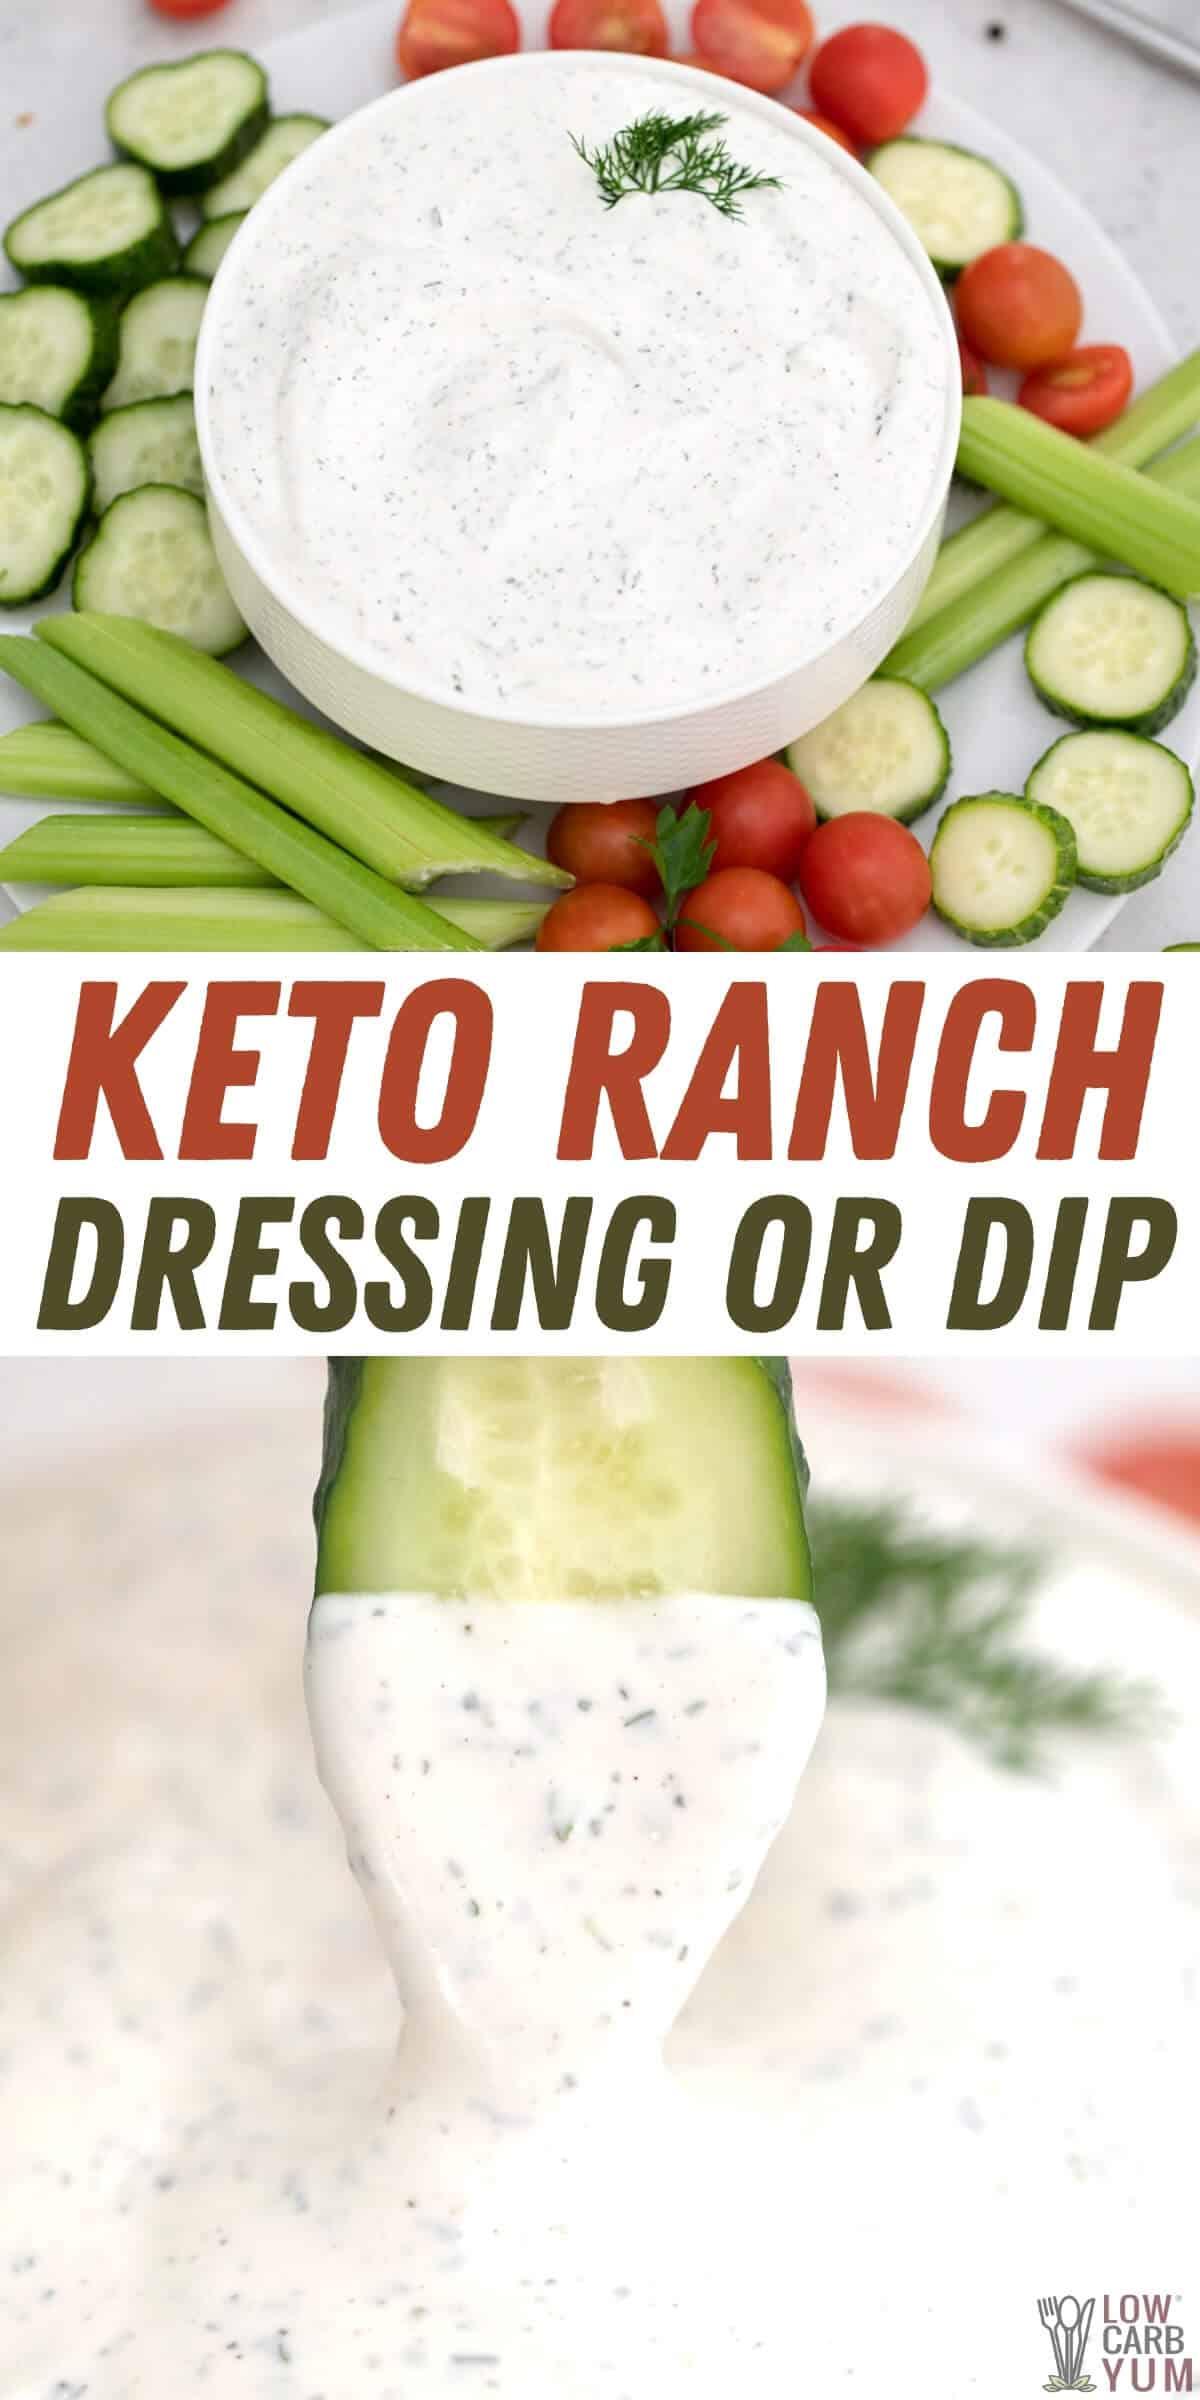 keto ranch dressing or dip pinterest image